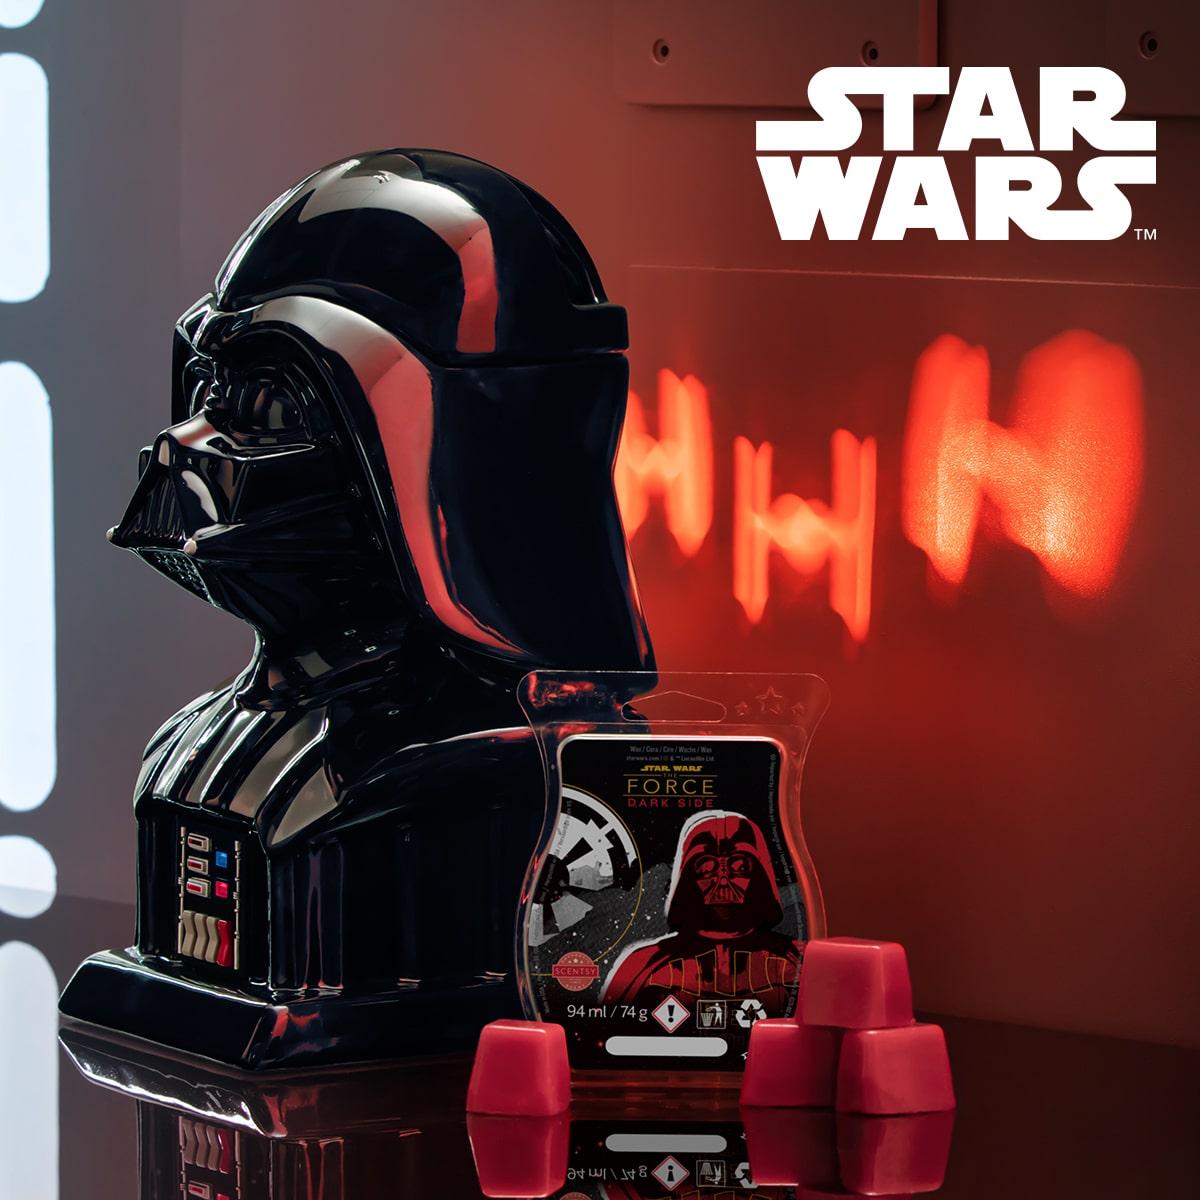 Scentsy Darth Vader Warmer & Wax Bar